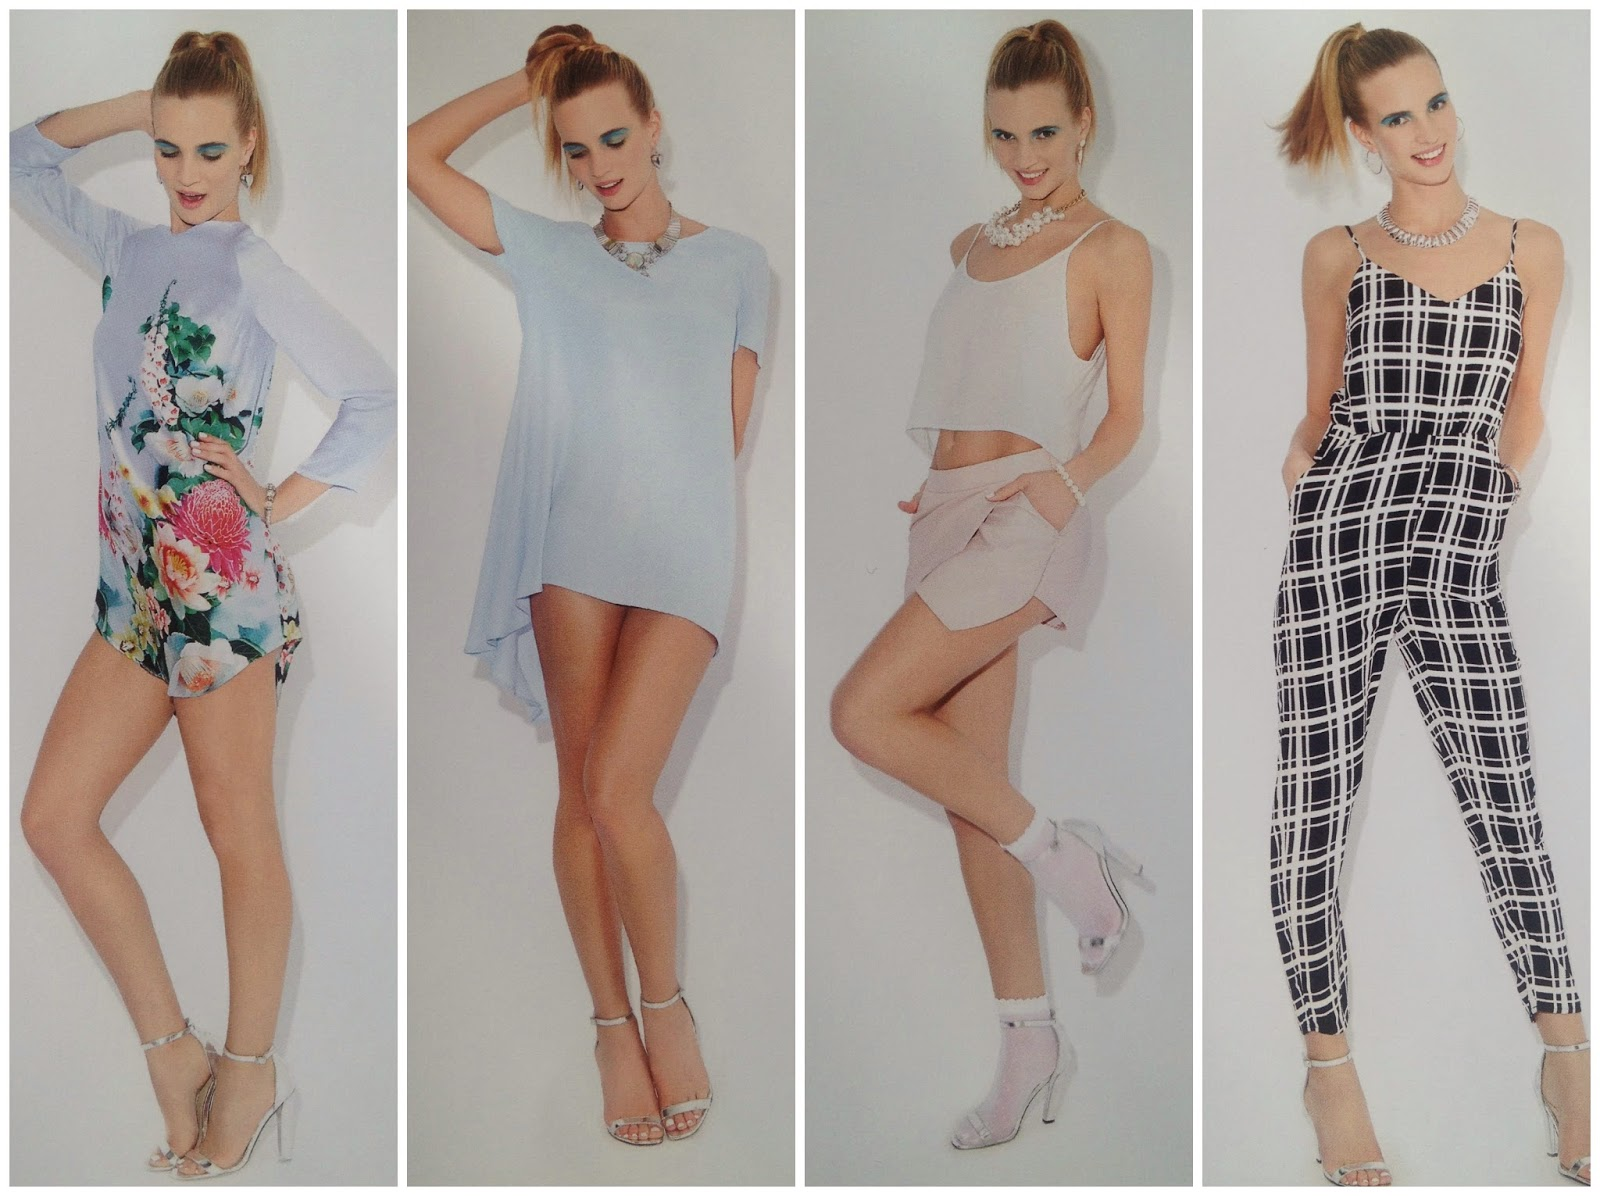 Lrsmth-Fashion Glamorous S/S Lookbook